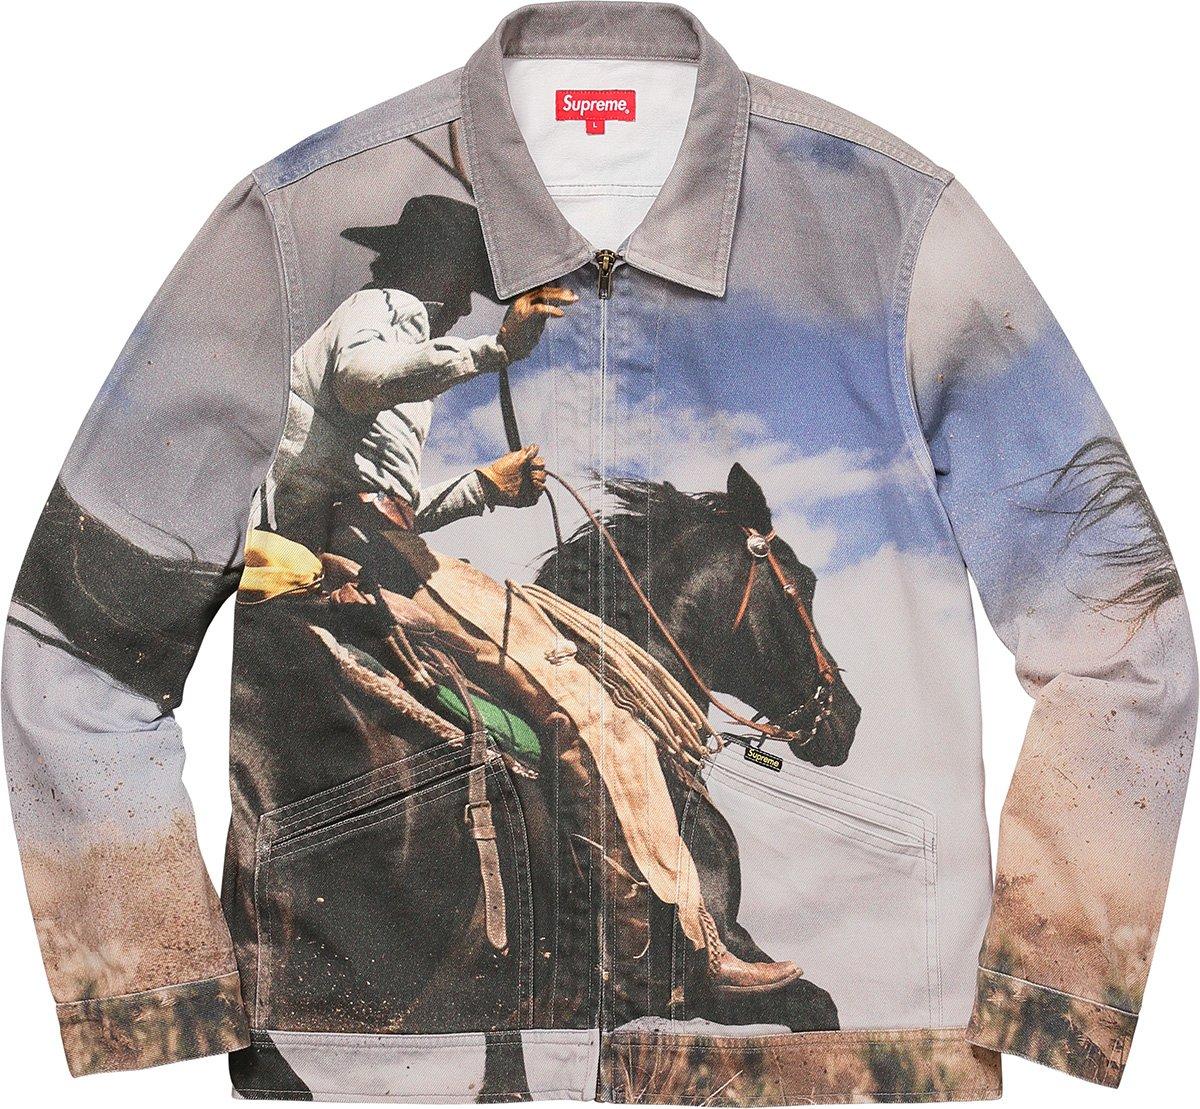 13aed4ad4a63 Details Supreme Cowboy Denim Work Jacket - Supreme Community